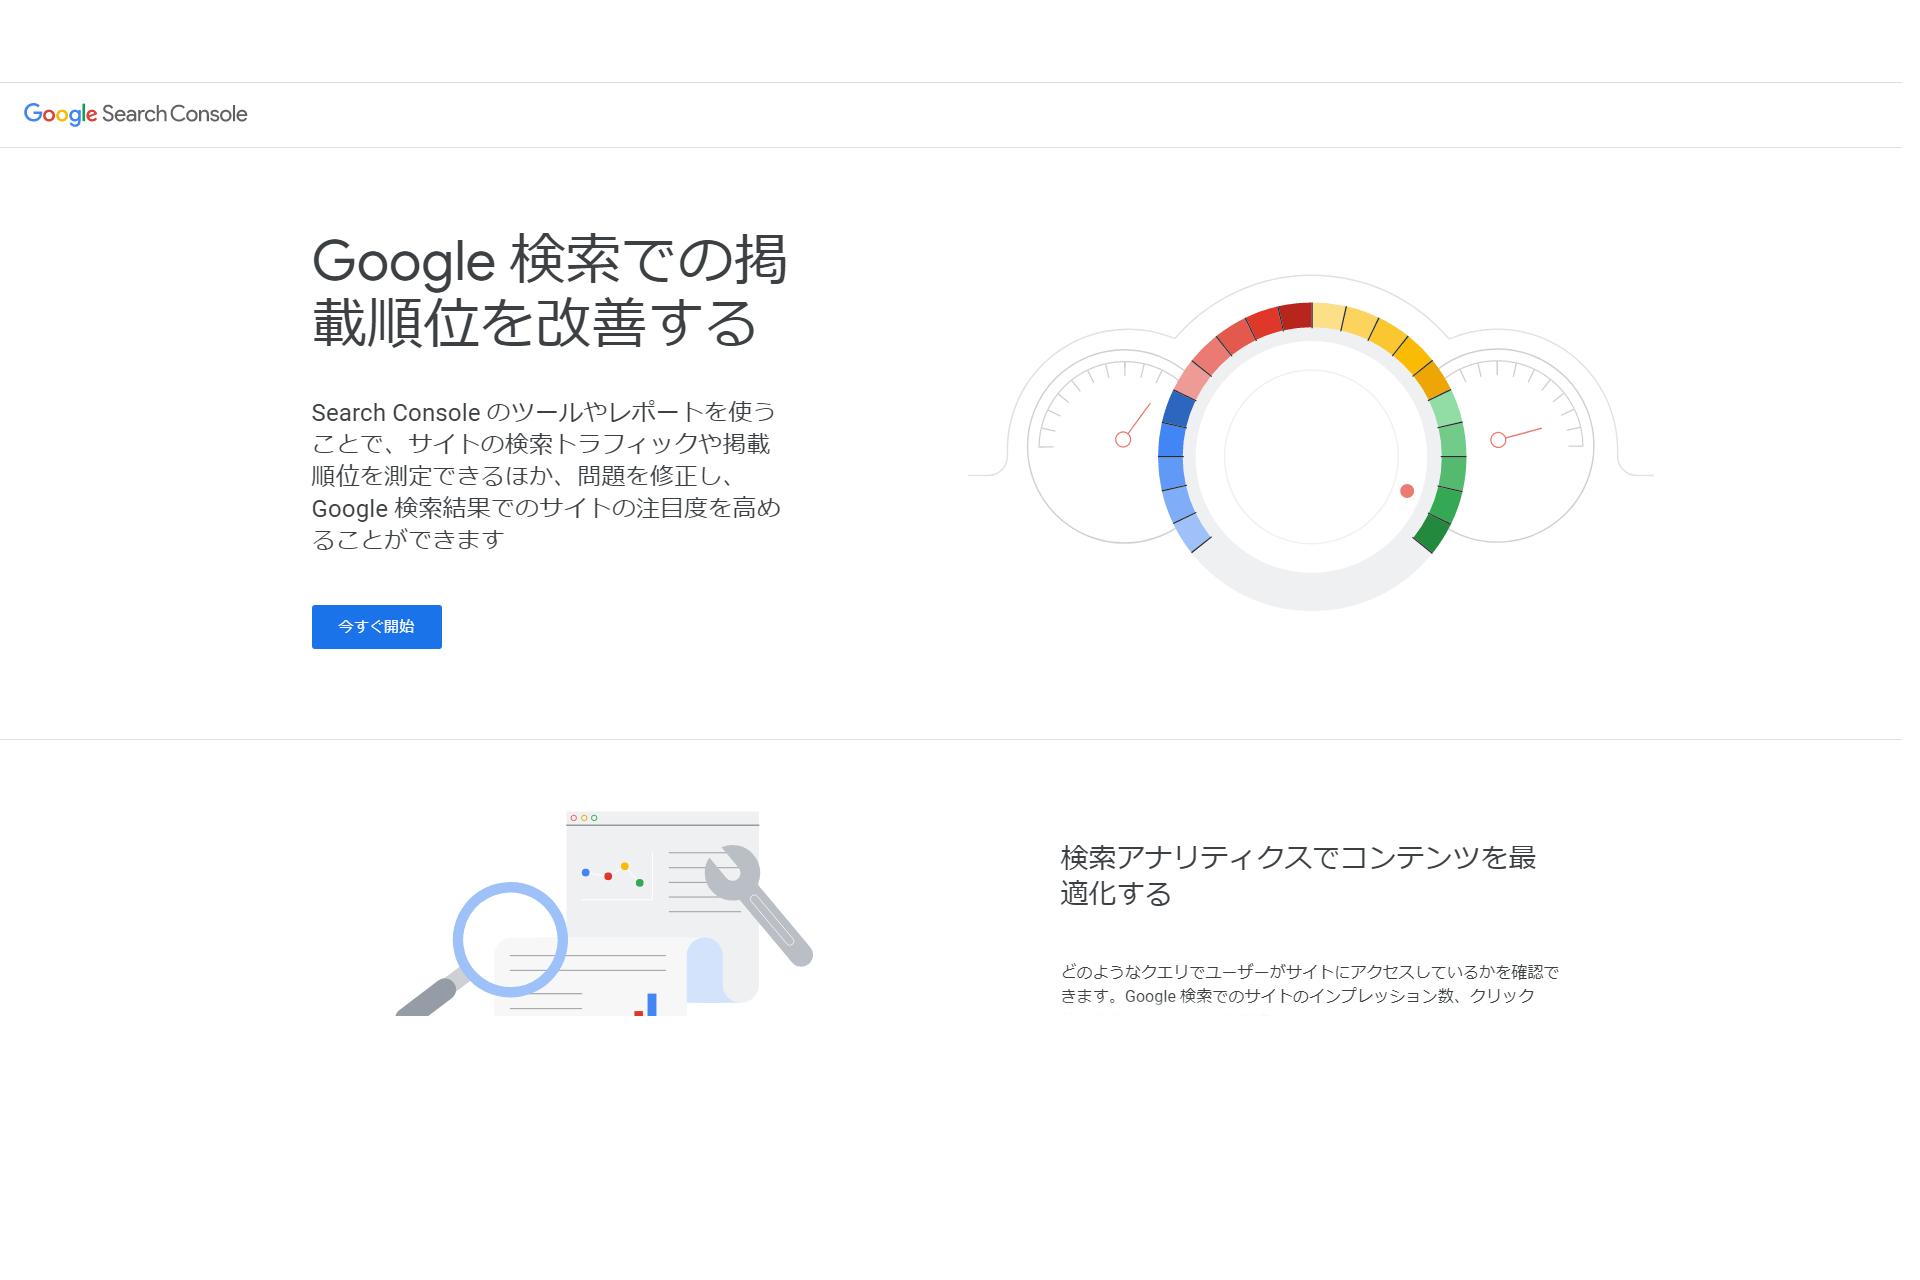 Search Console(サーチコンソール)のサイト登録を開始する